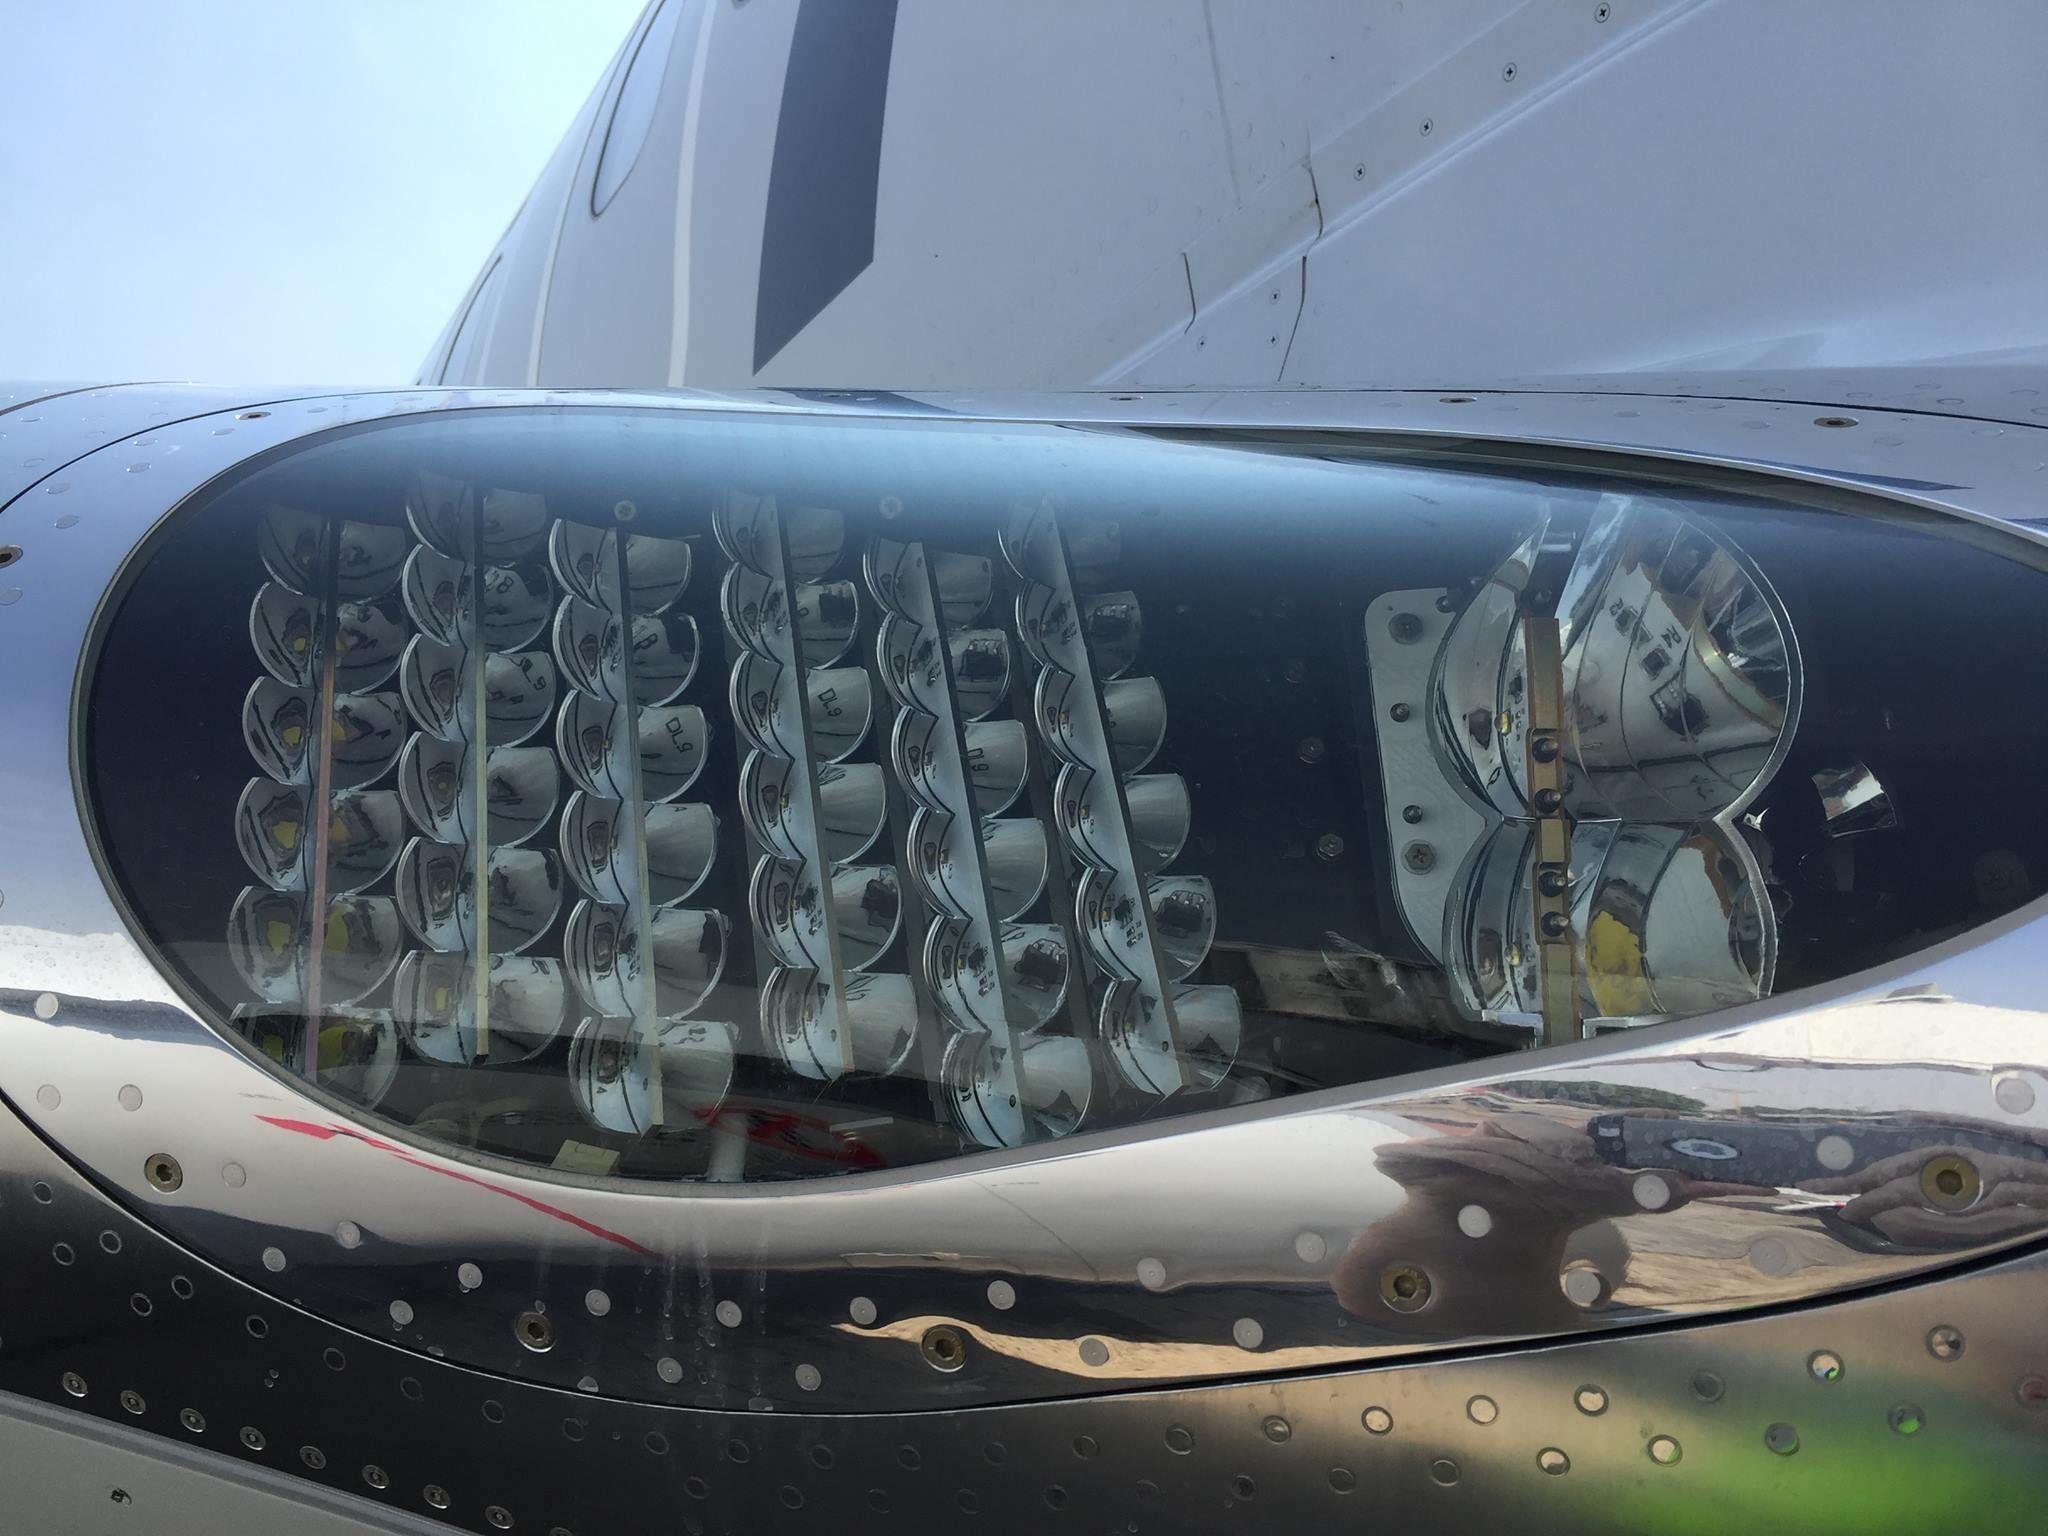 New LED landing lights | Boeing/Douglas/McDonnell Douglas | Aircraft